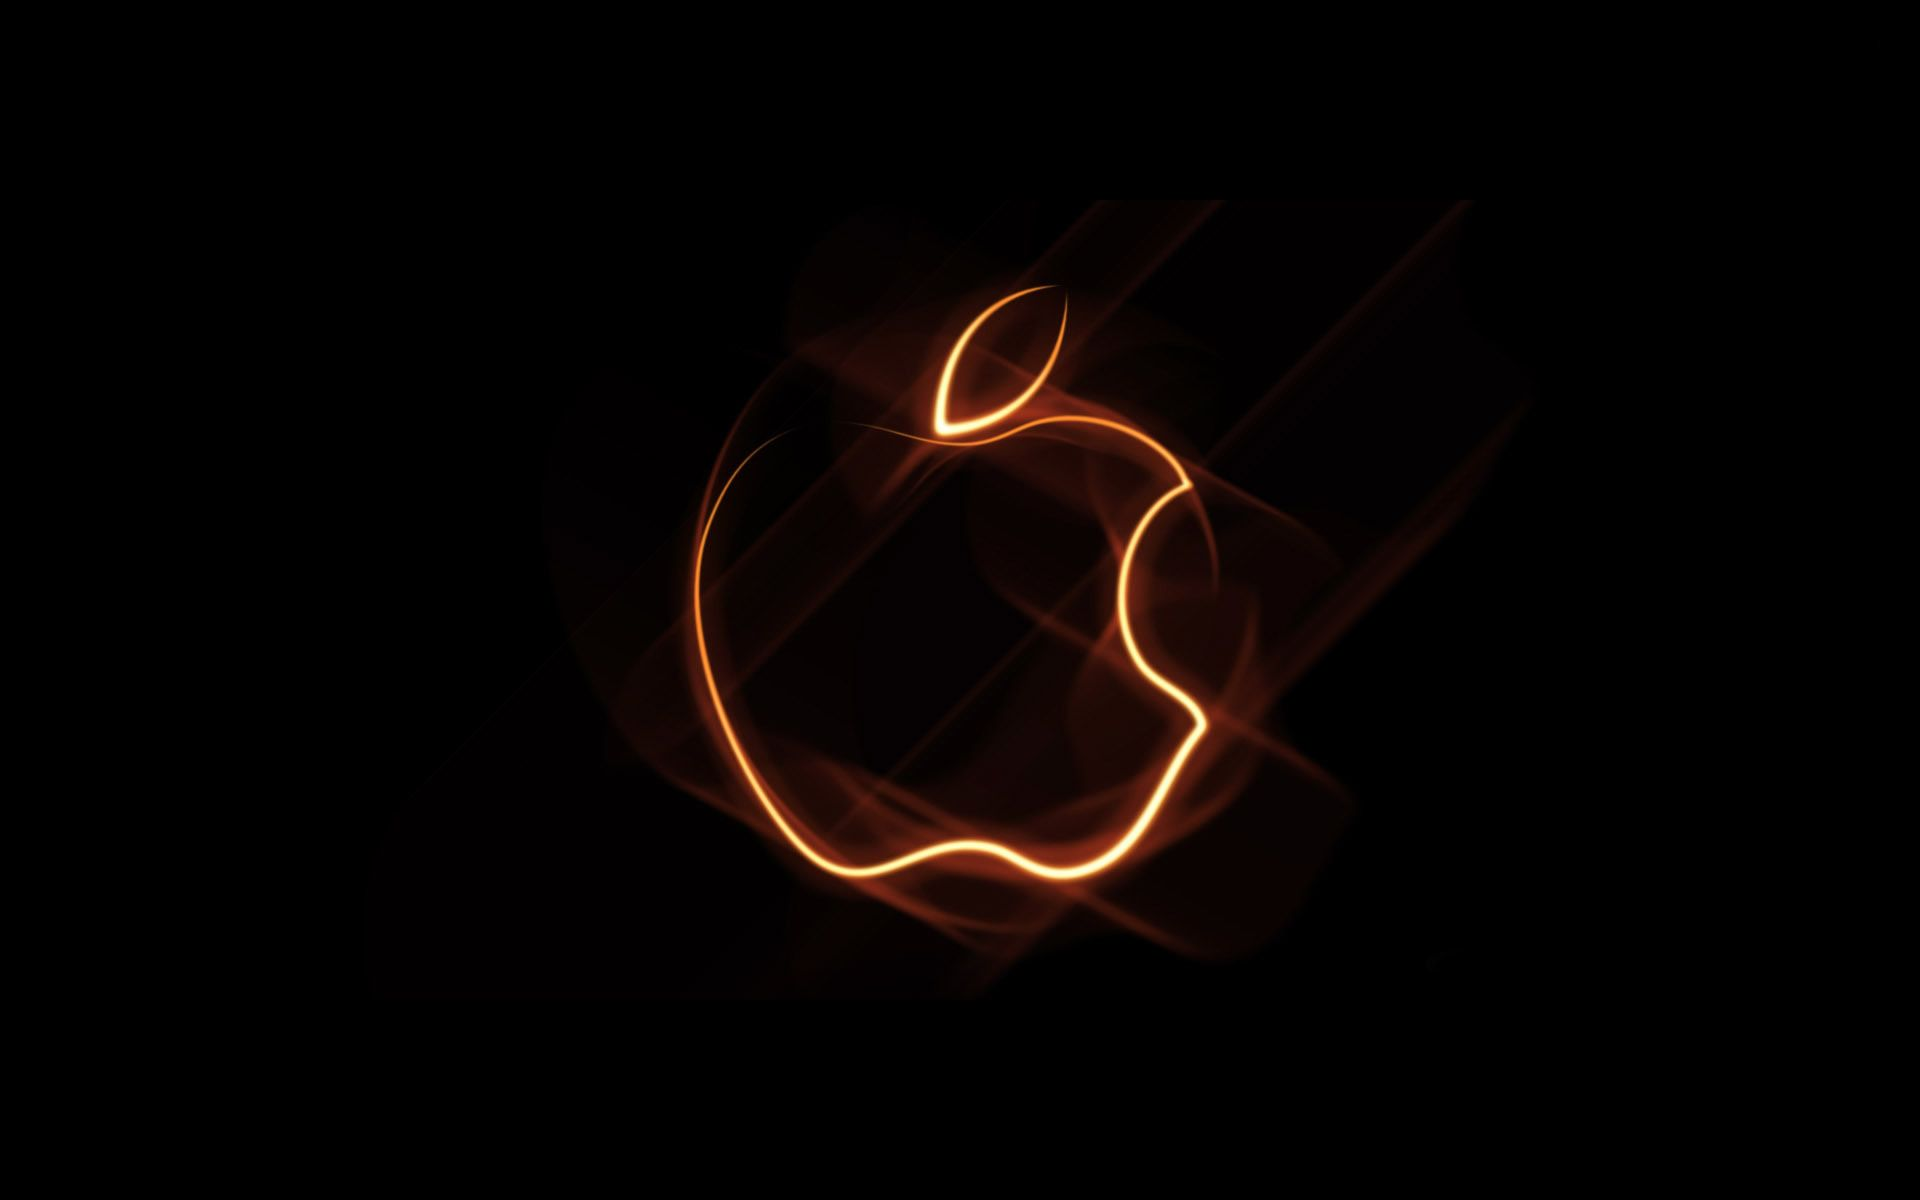 Hd wallpaper macbook - Apple Logo Wallpaper Wallpaper Background Hd Apple Sign